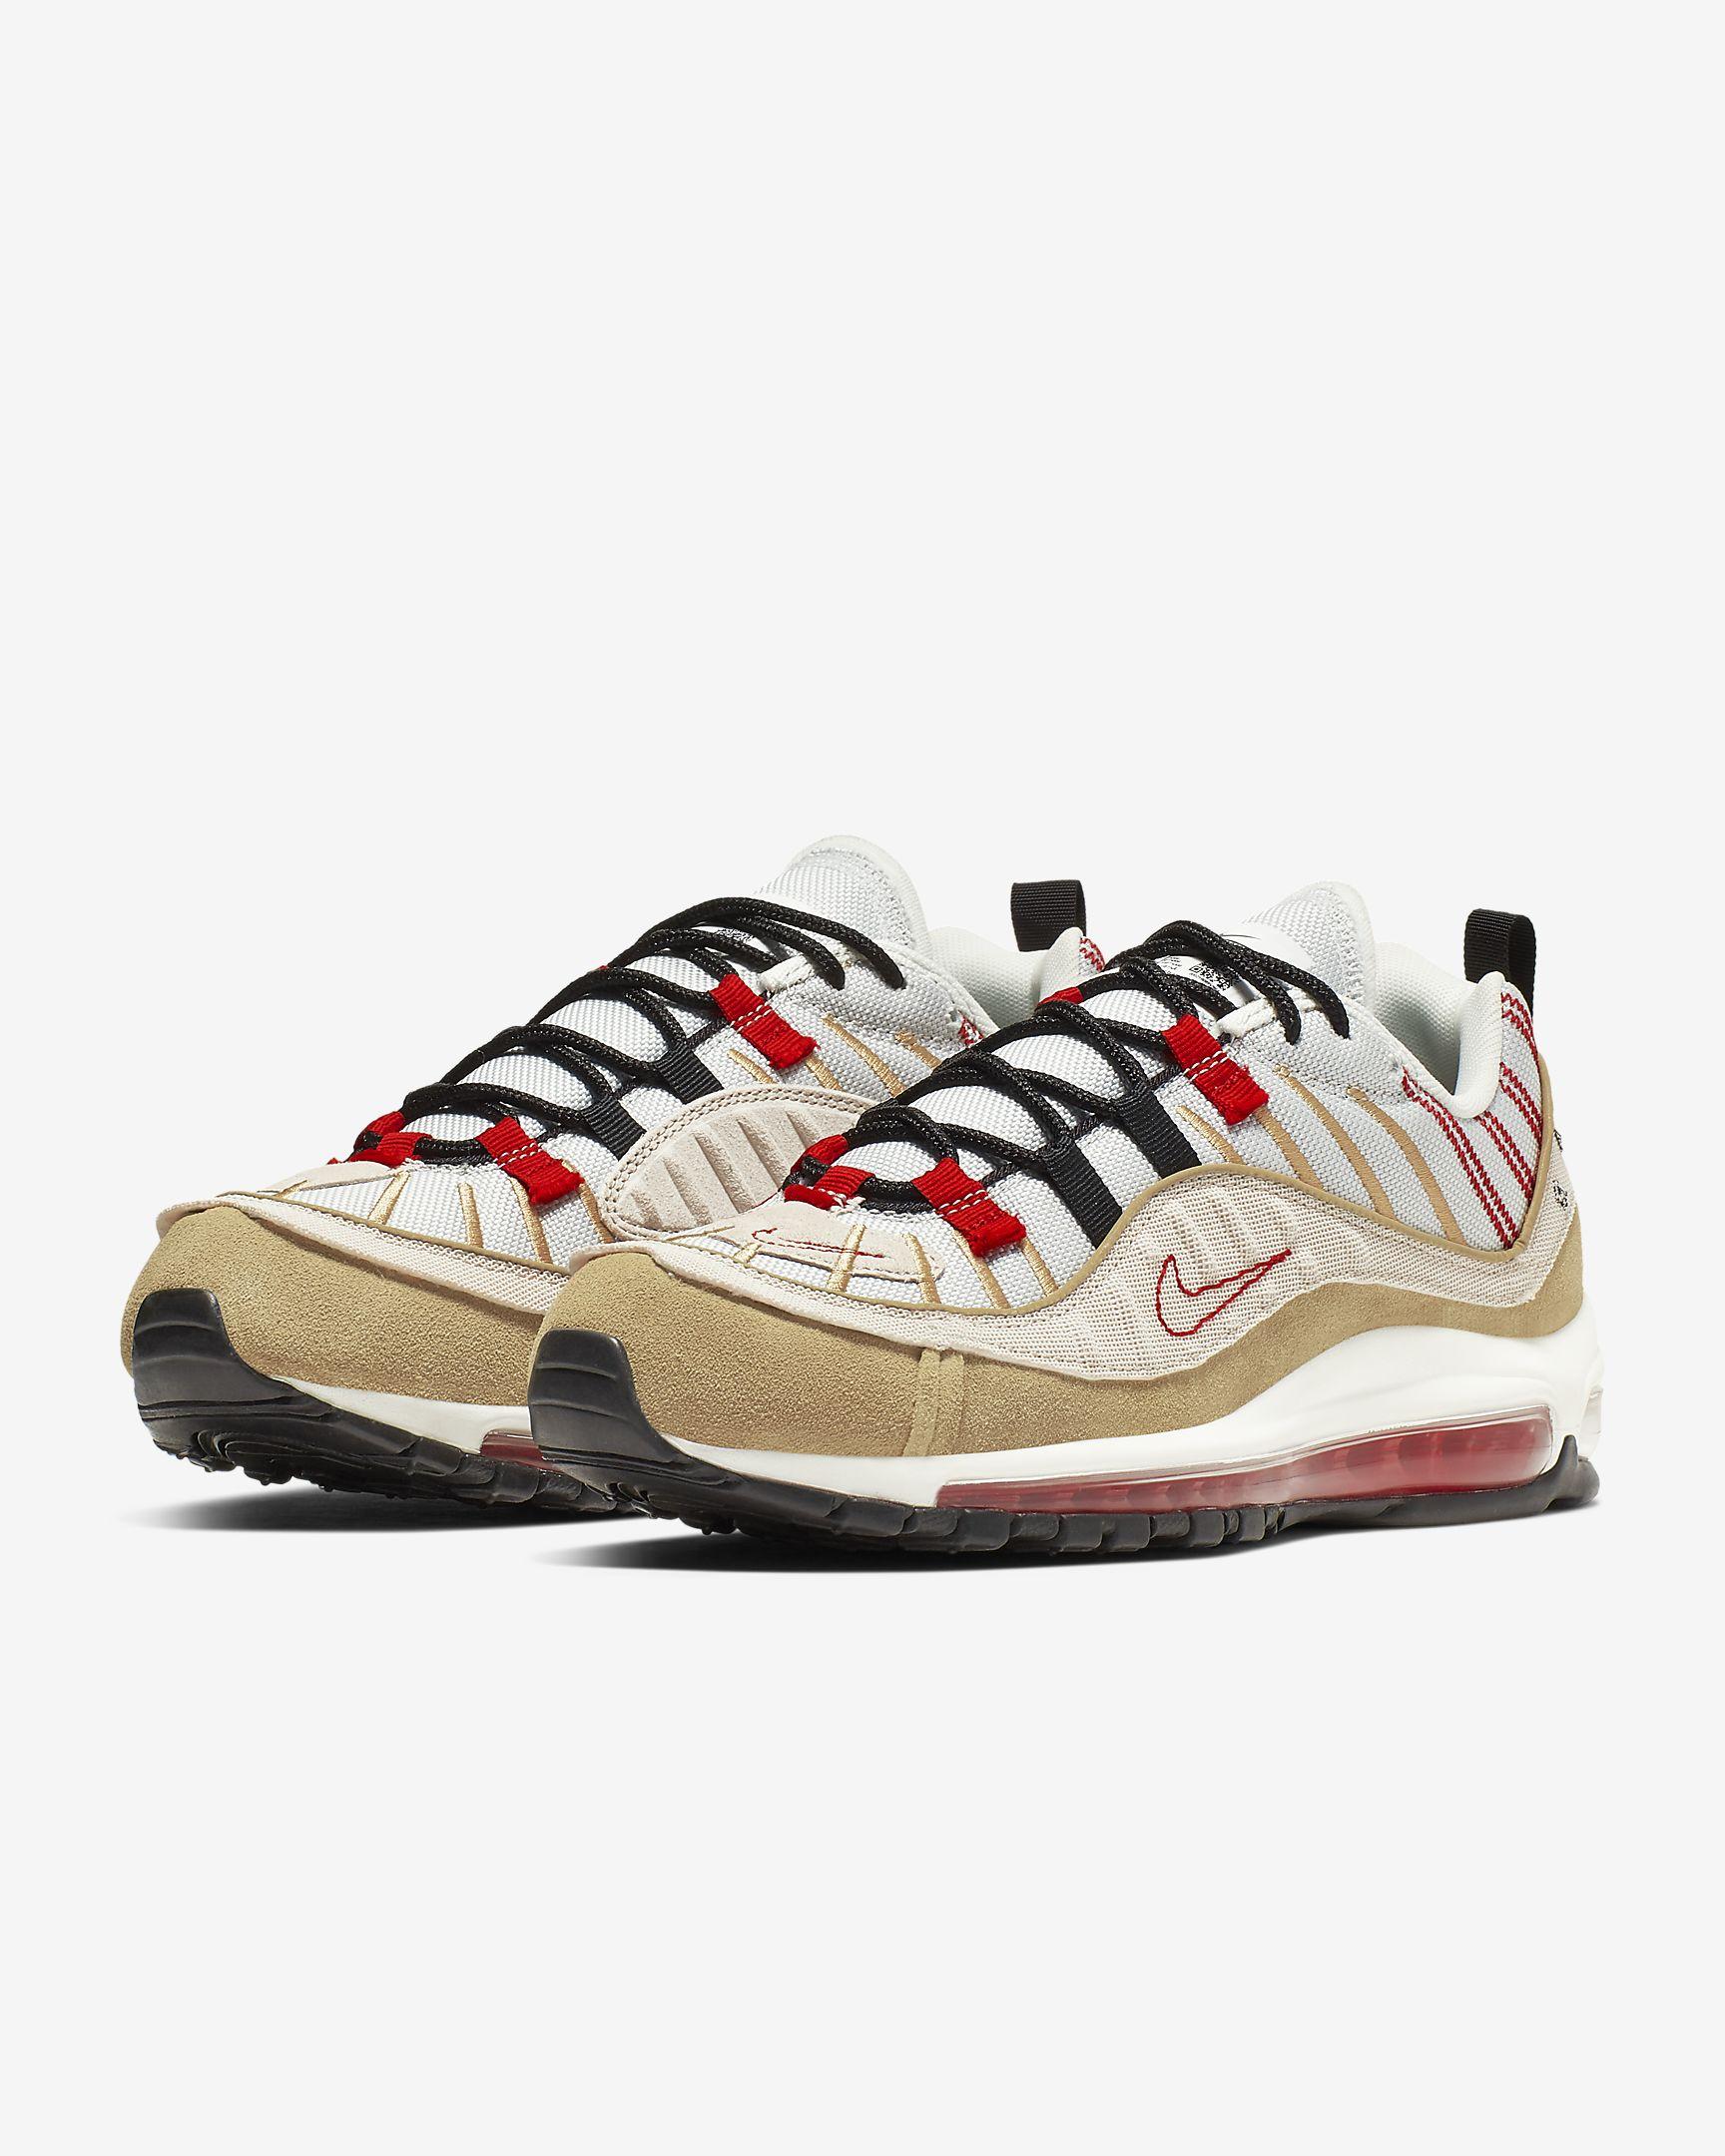 Nike Air Max 98 Retro Scheduled? via NB Side 197NikeTalk Side 197 NikeTalk